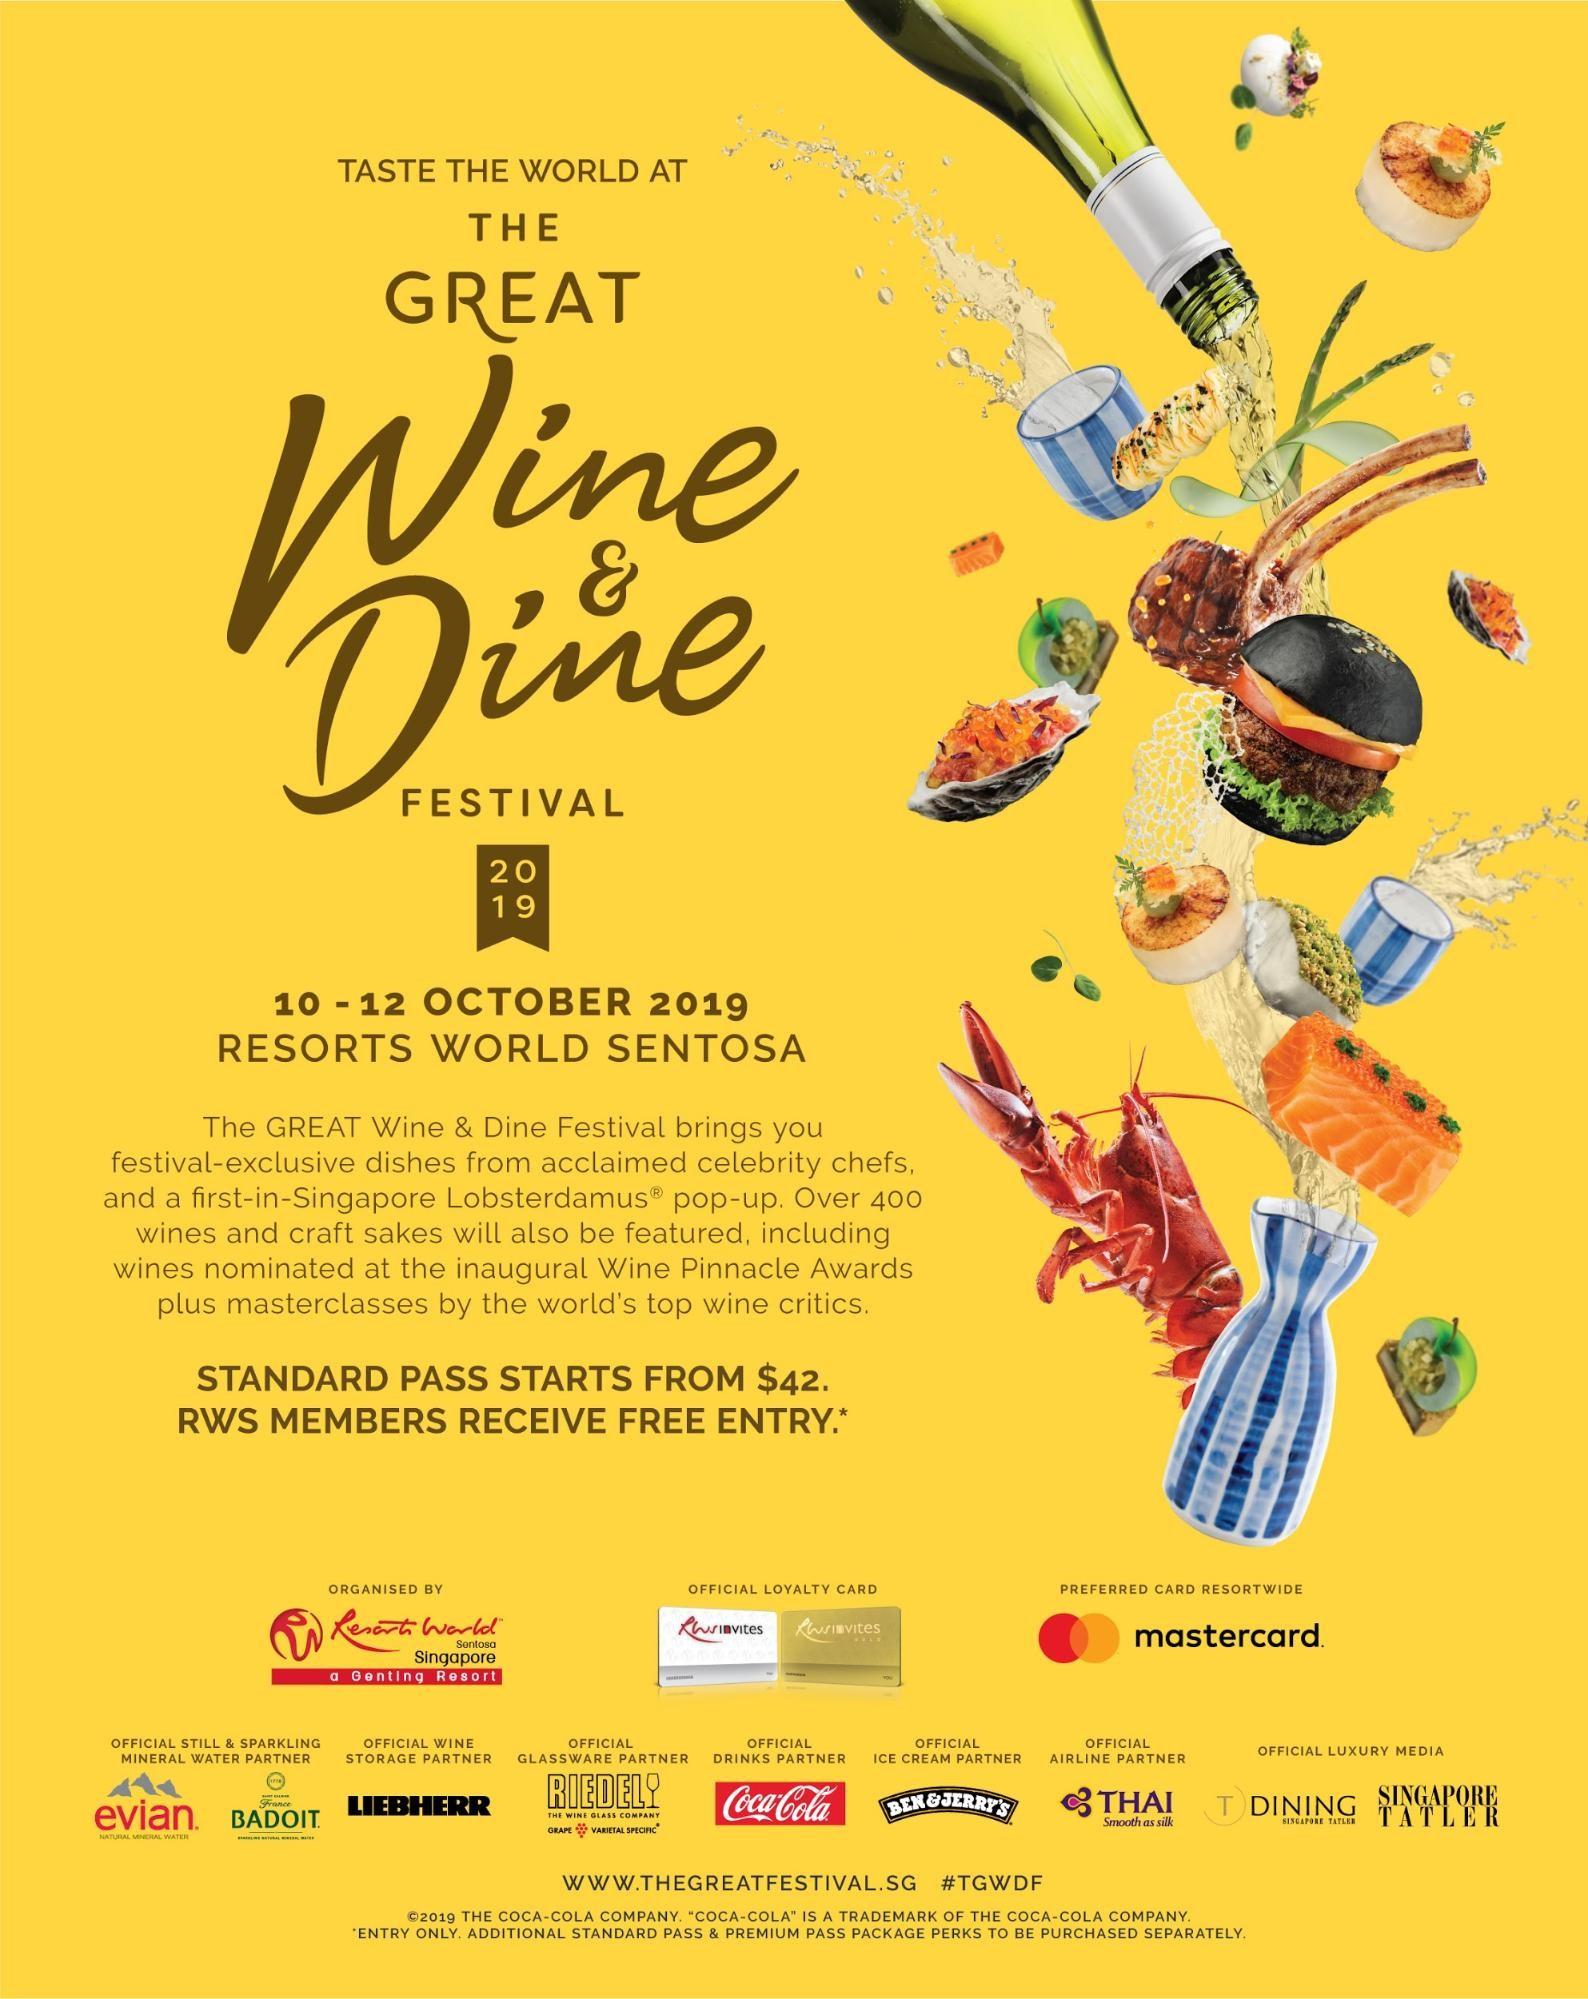 rws the great wine & dine festival 2019